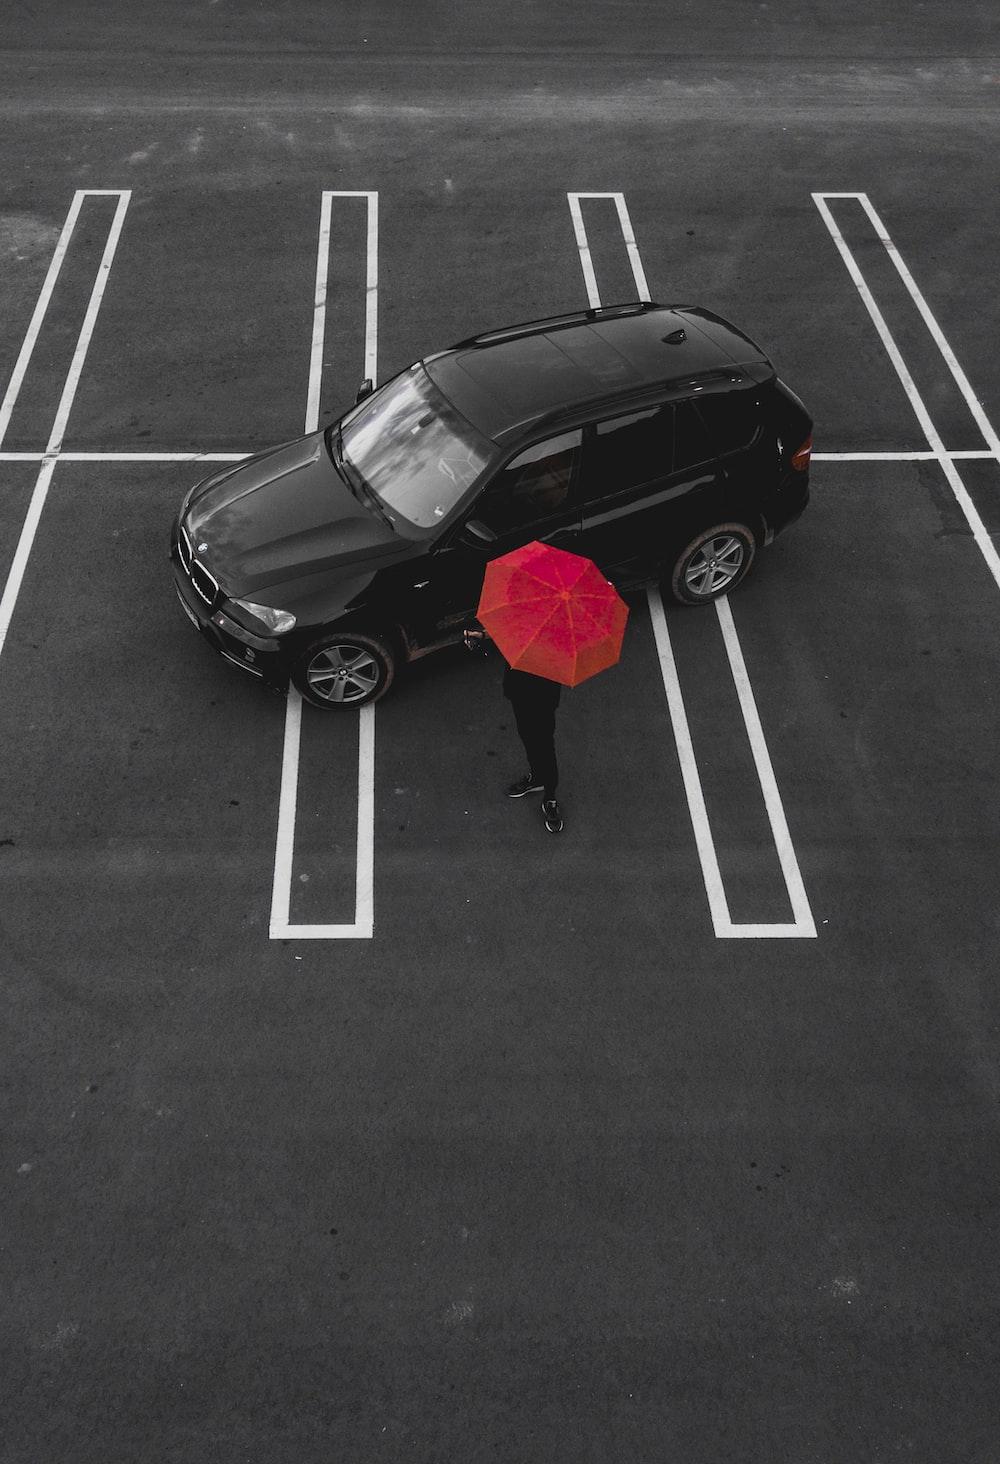 person holding red umbrella standing near black SUV